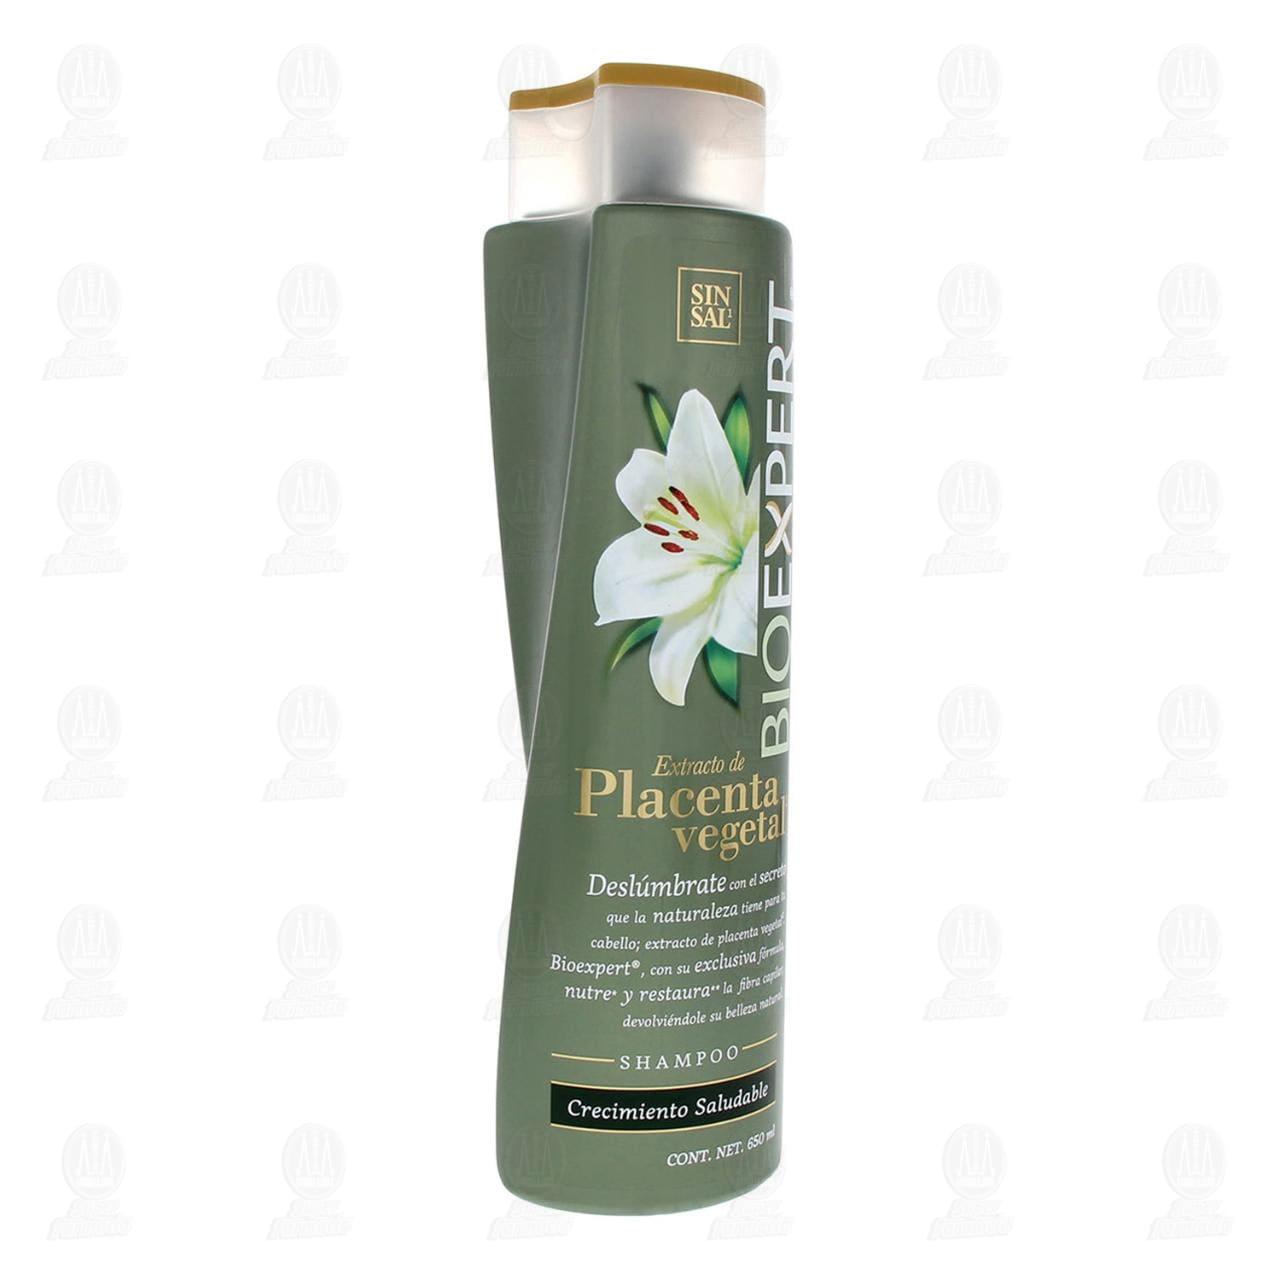 Comprar Shampoo Bioexpert Extracto de Placenta Vegetal, 650 ml. en Farmacias Guadalajara